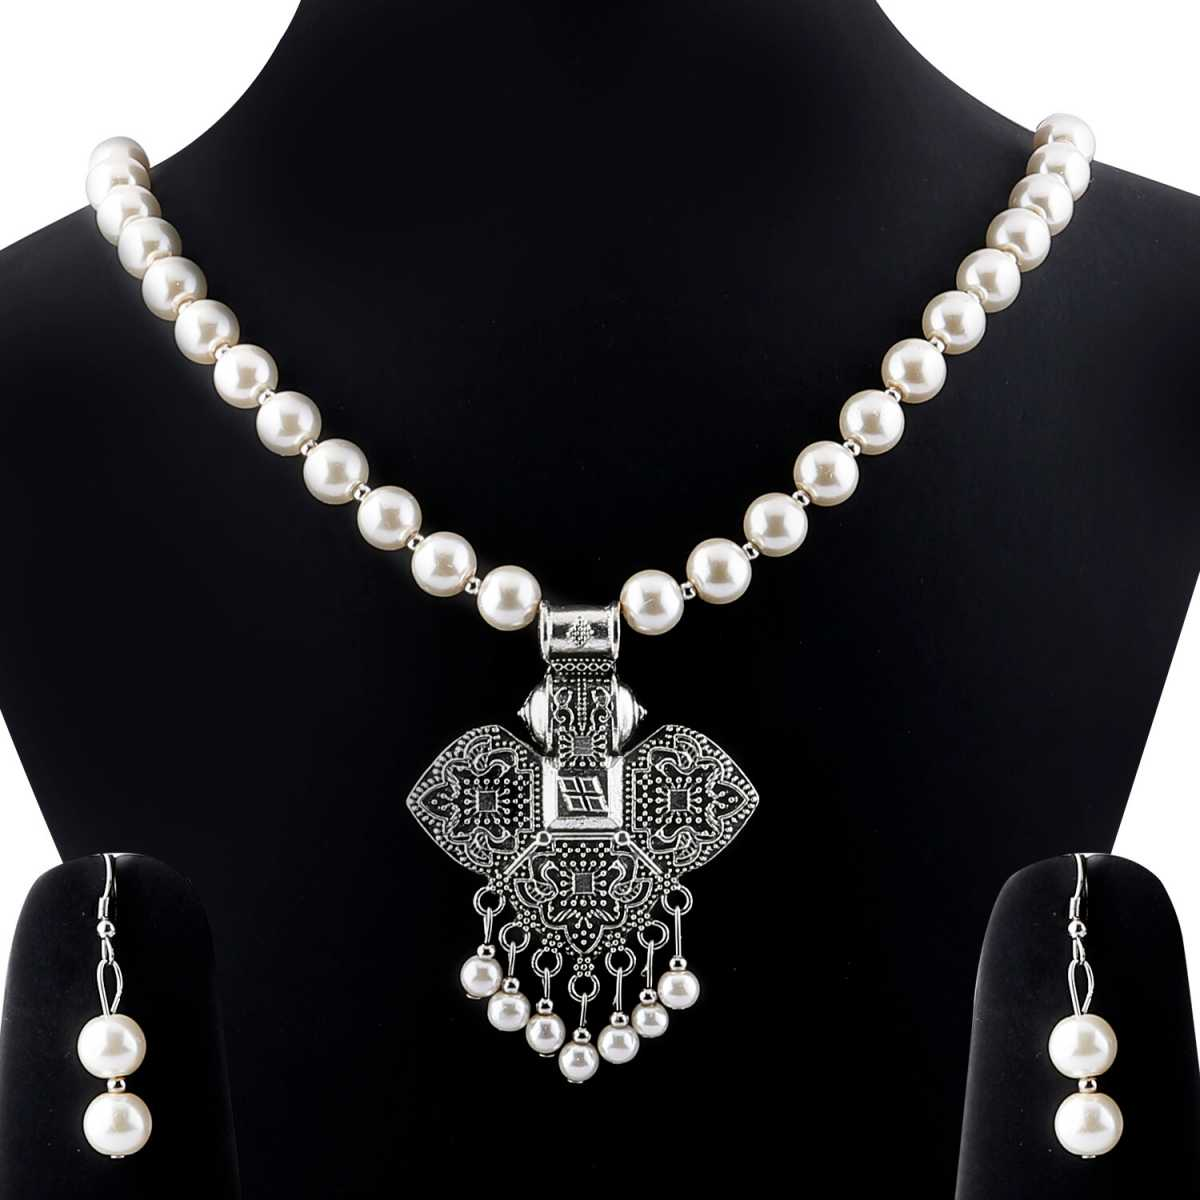 Exclusive Oxidised Pendant White Pearl Jewellery set for Women